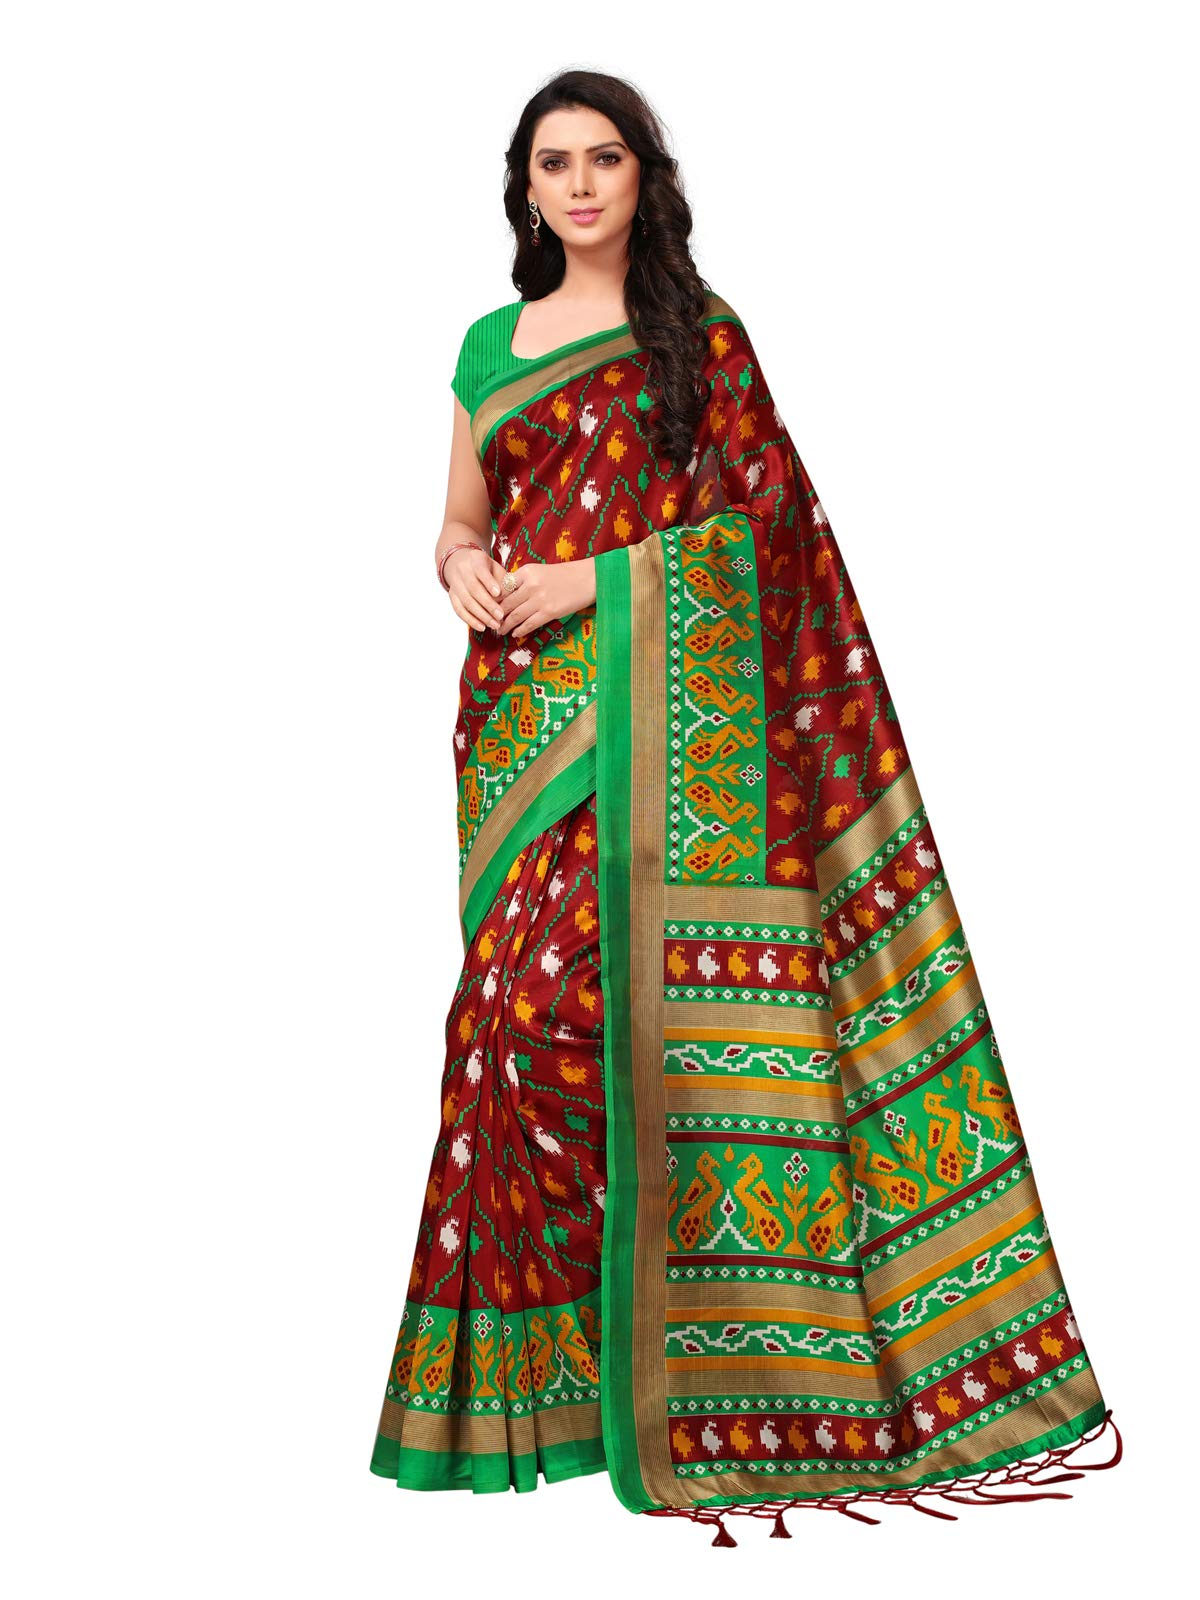 Kanchnar Women's Maroon Poly Silk Printed Saree735S23